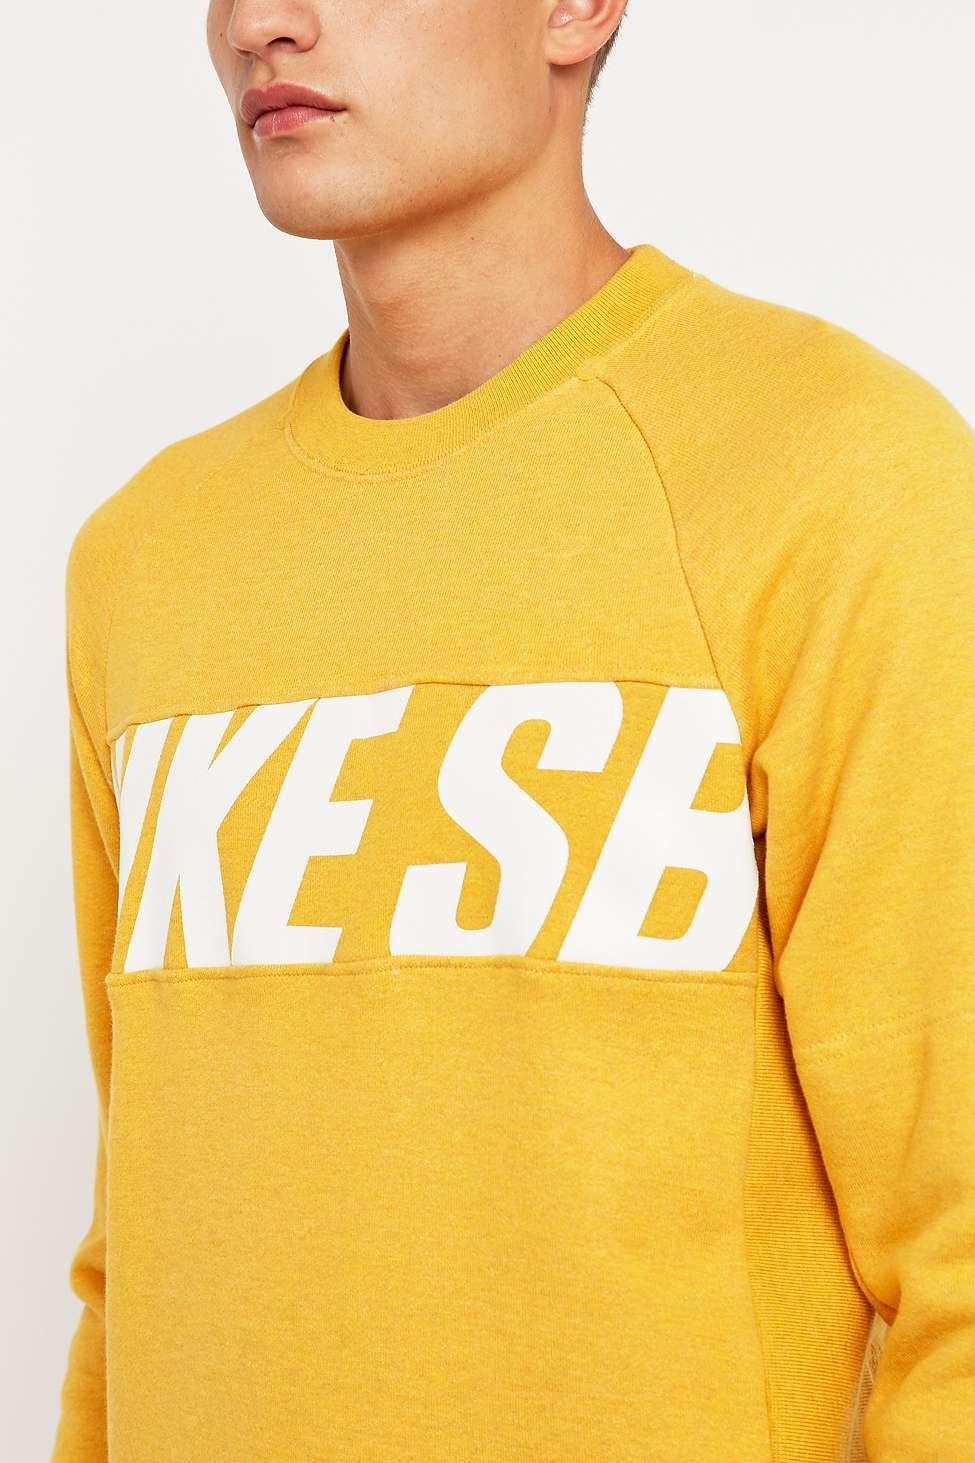 67db8c3ca0b1 Nike SB Everett Motion Crewneck Sweatshirt